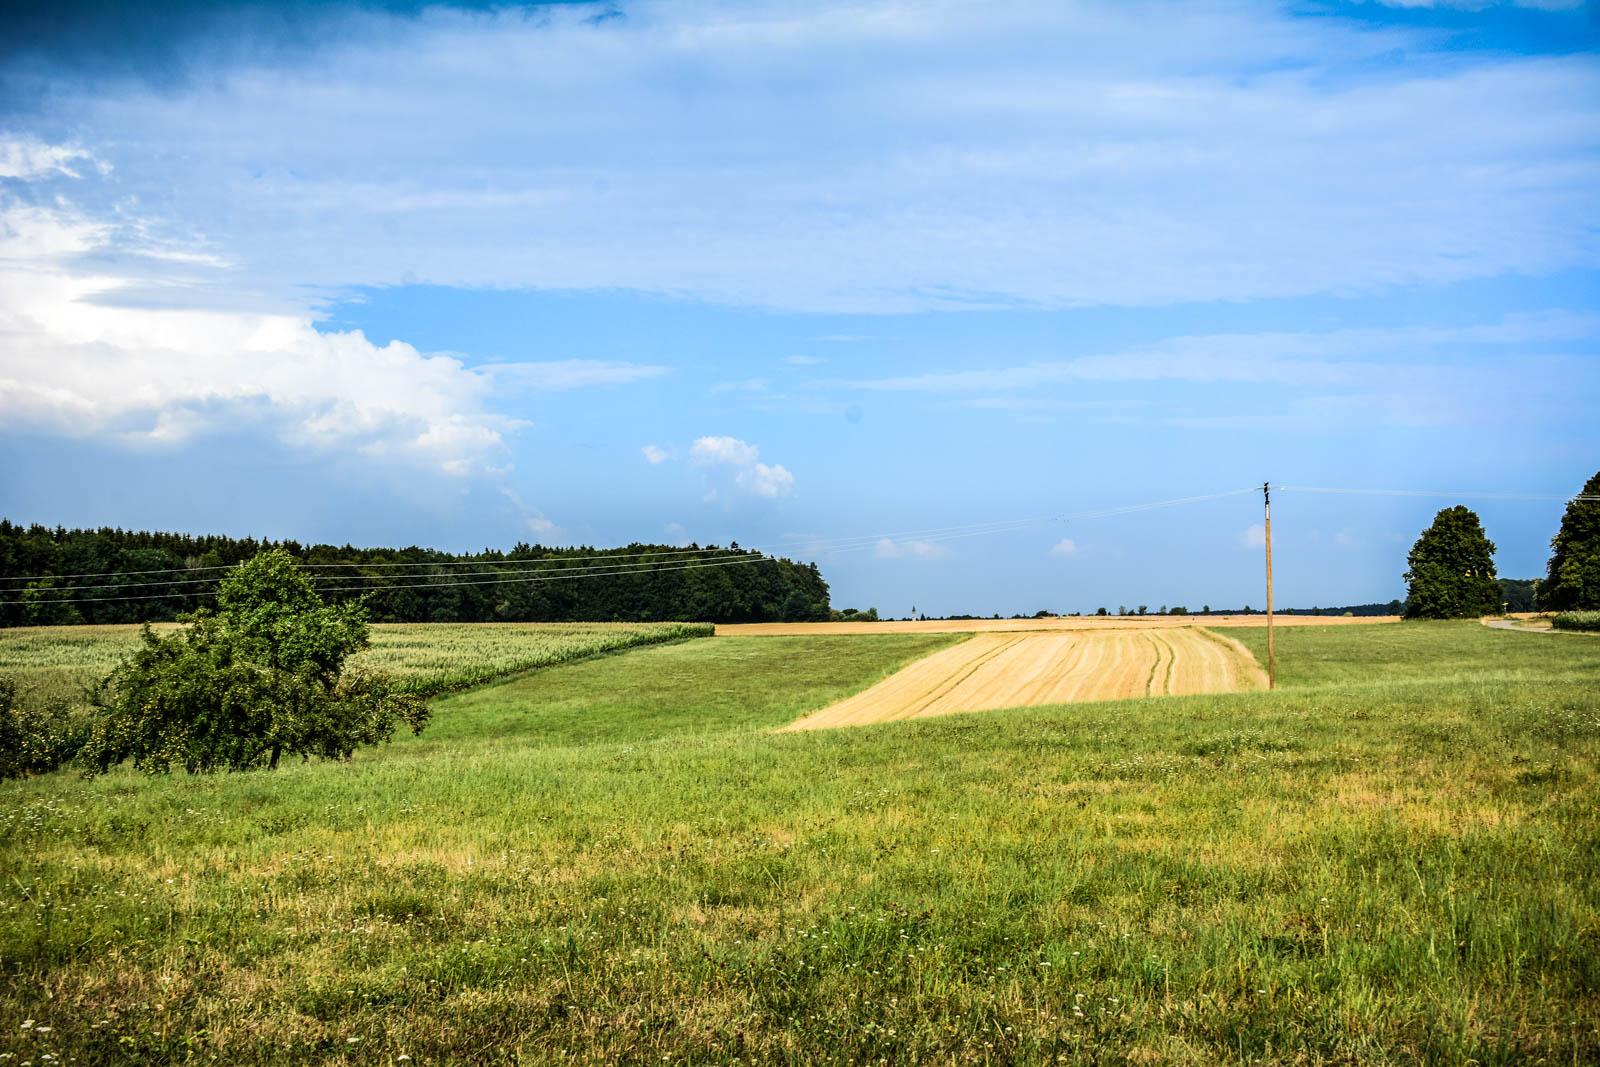 Die Landschaft In Unmittelbarer Umgebung